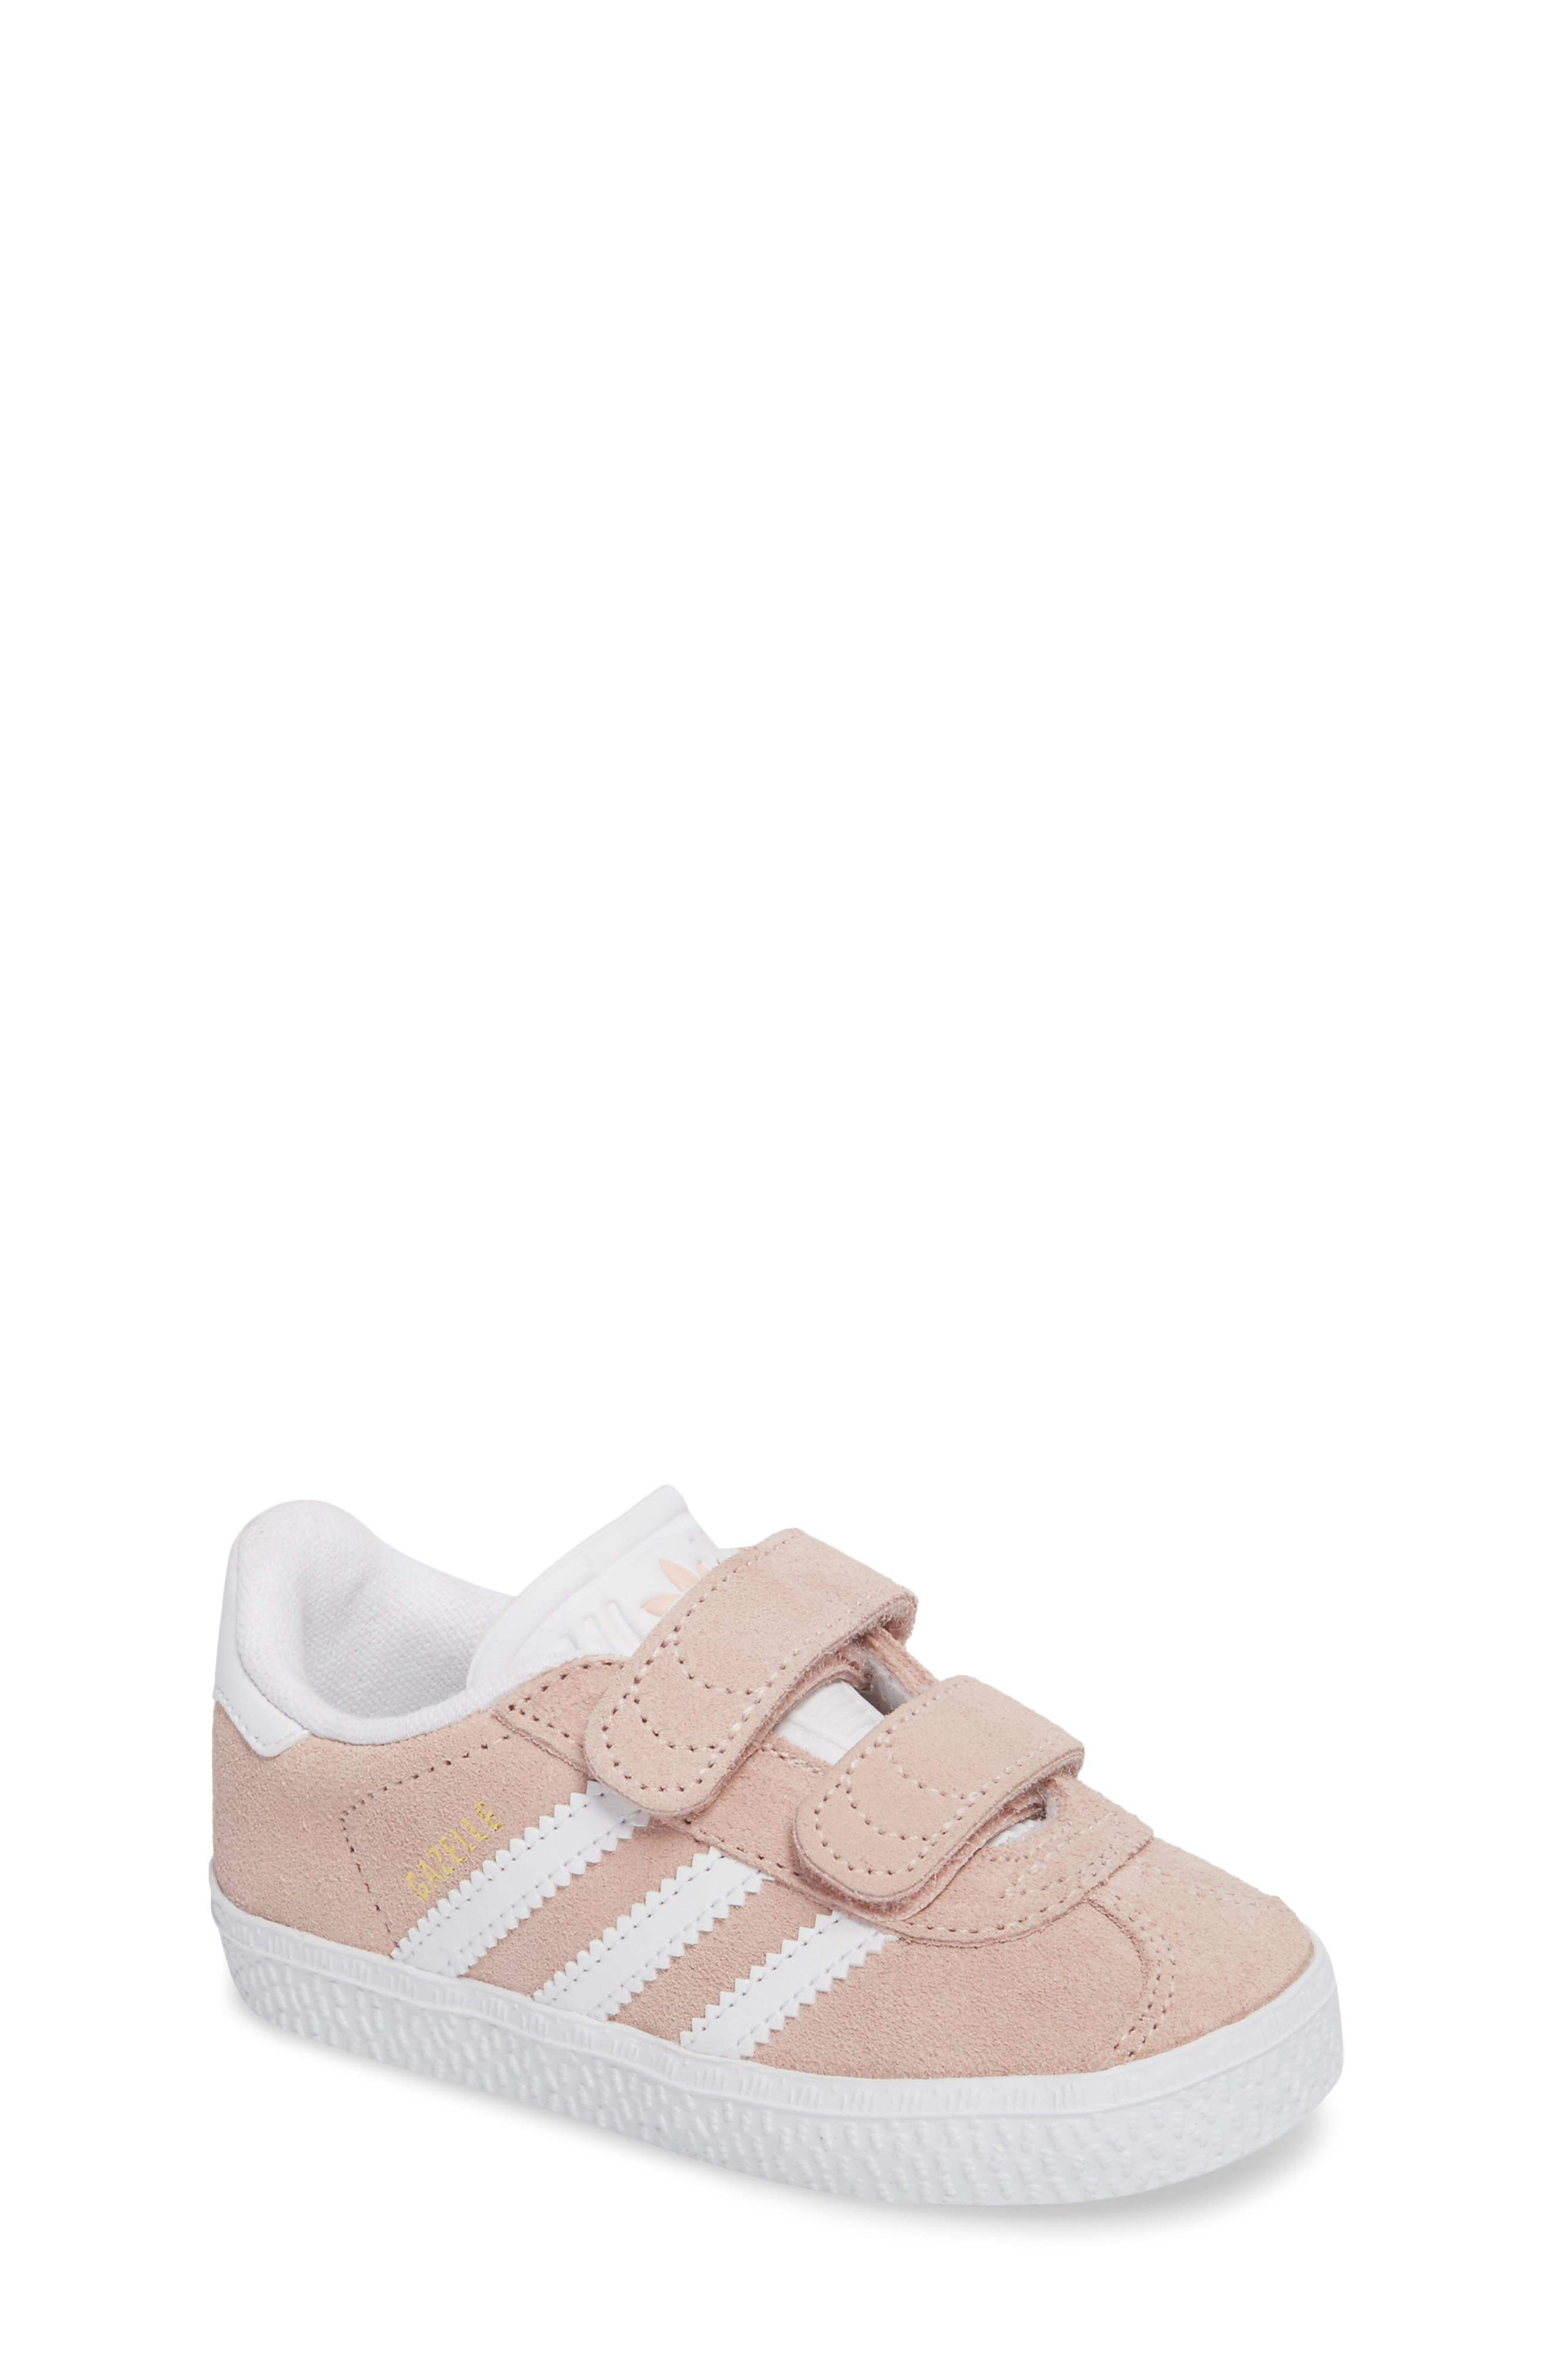 adidas Gazelle Sneaker (Baby, Walker \u0026 Toddler)